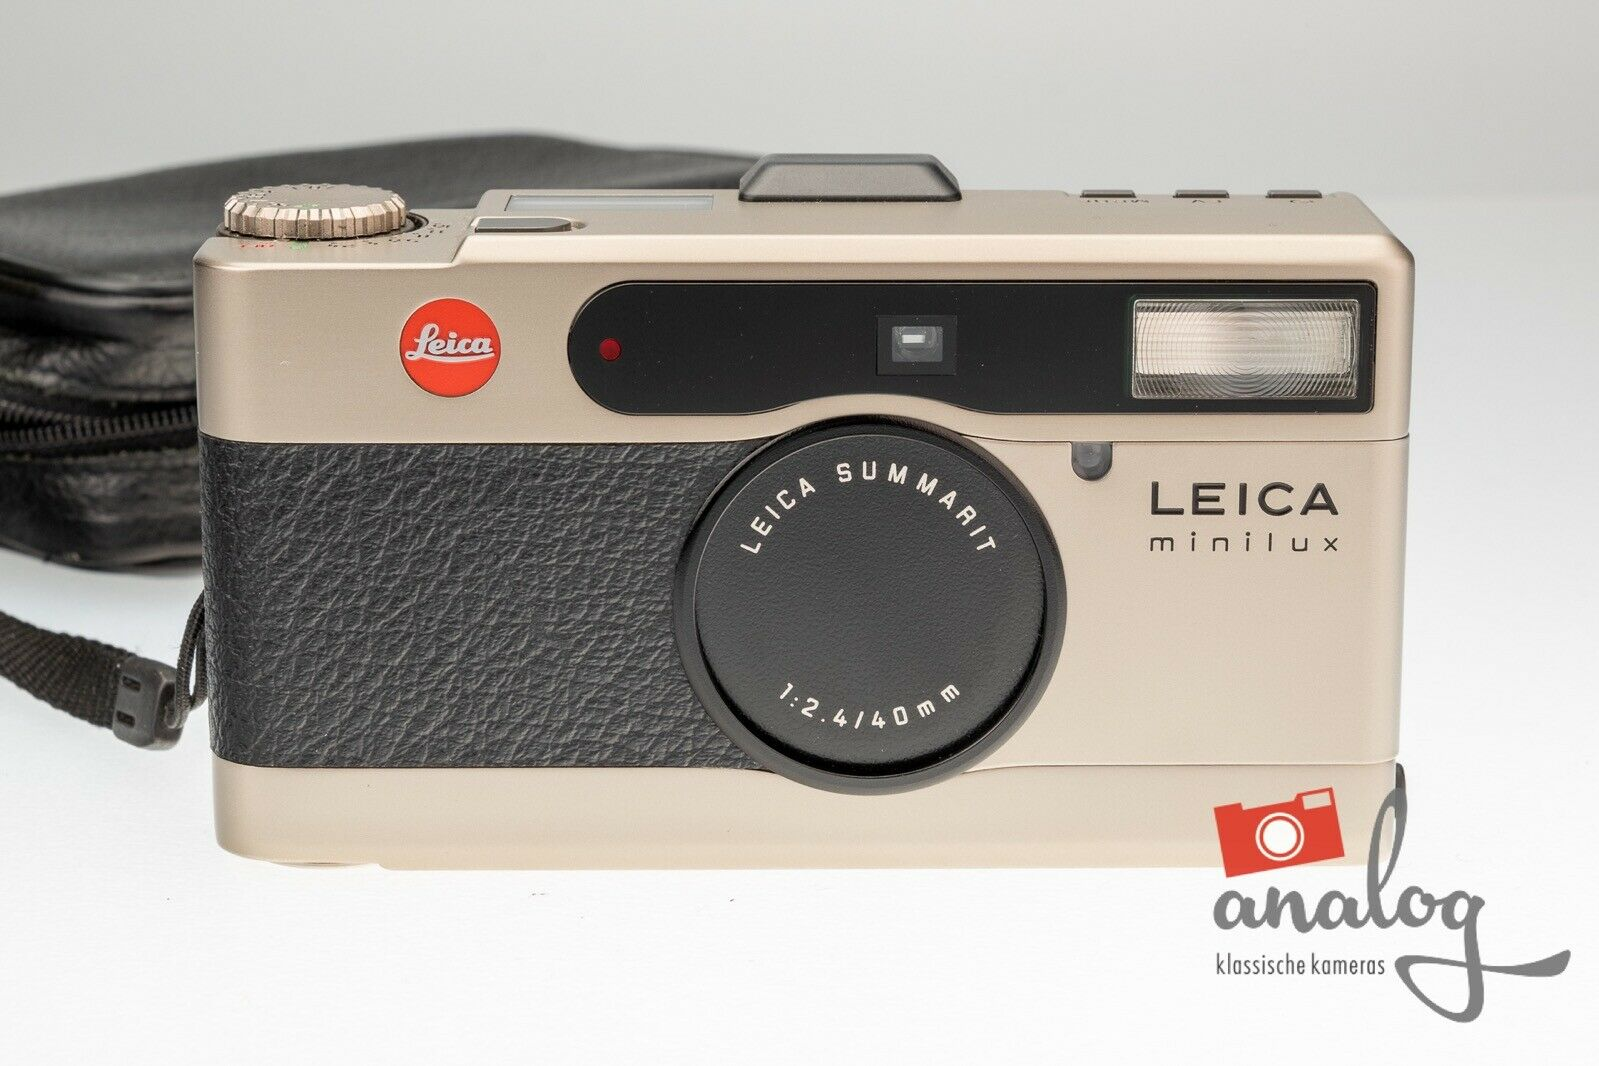 Leica Minilux mit Leica Summarit 40mm 2.4